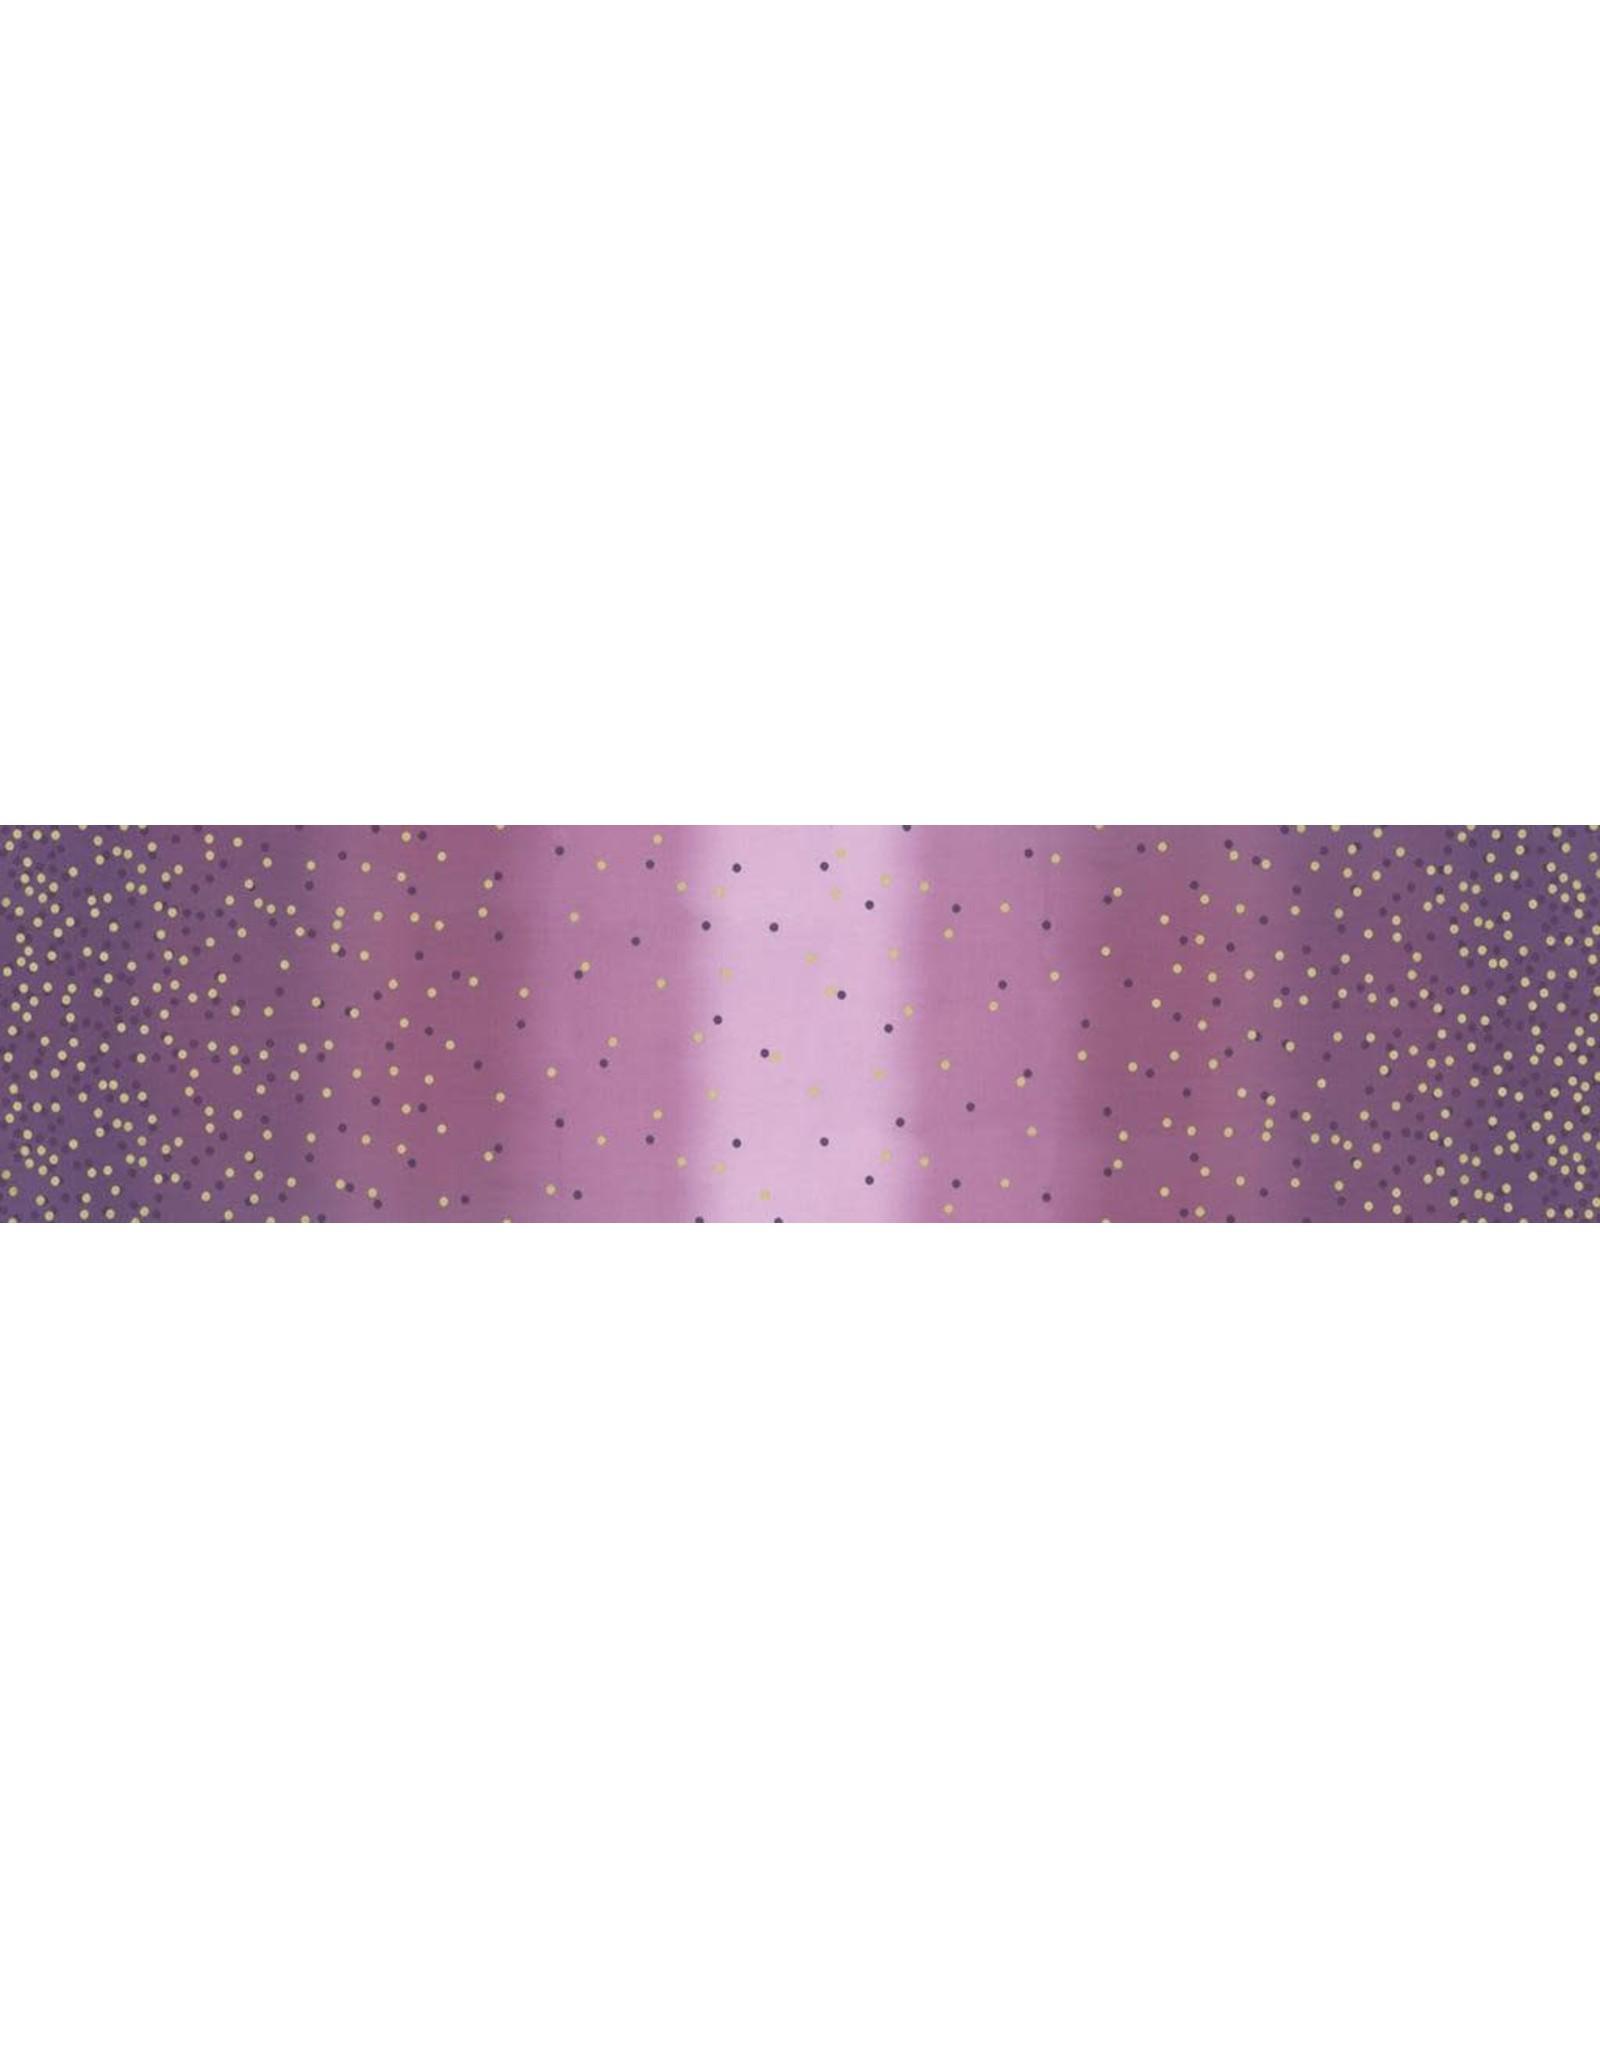 V & Co. ON SALE-Ombre Confetti New in Mauve, Fabric FULL-Yards